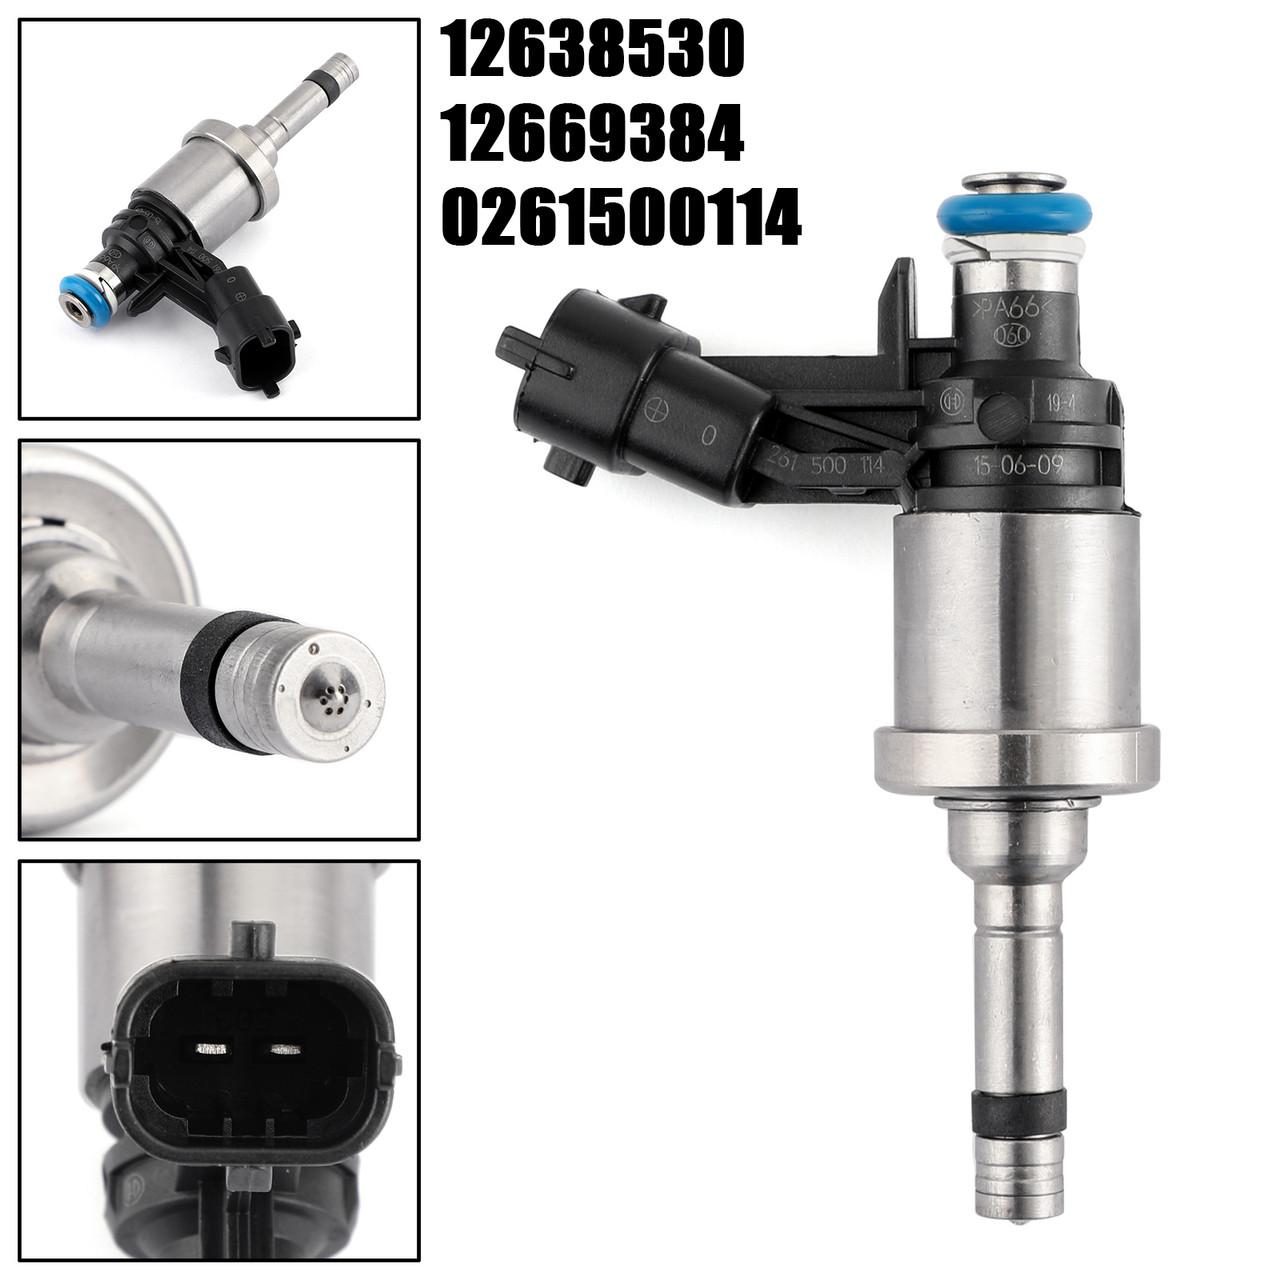 6x Fuel Injectors For GM Chevrolet Camaro Traverse GMC Acadia CTS 3.6L 12638530